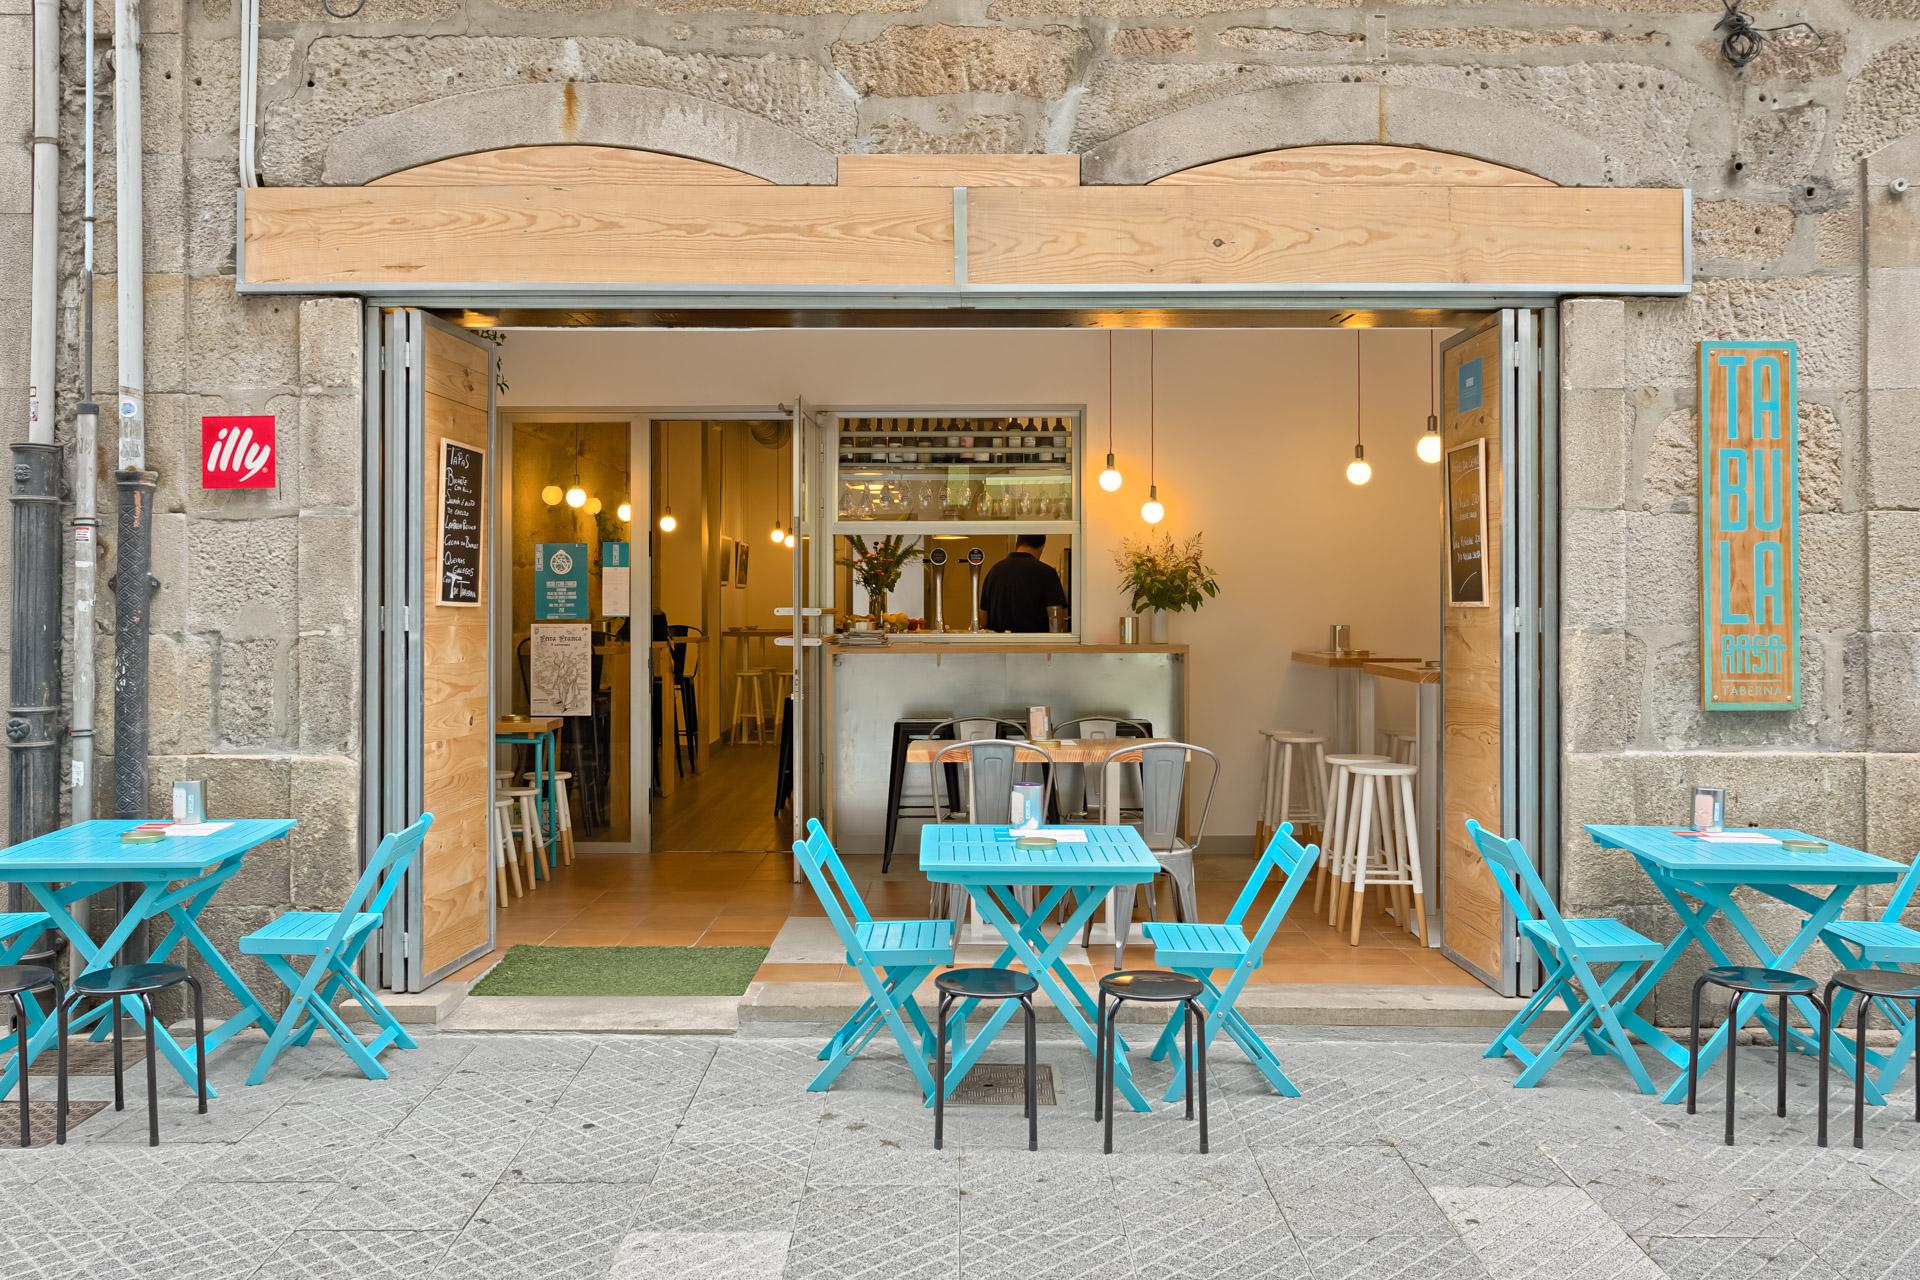 Taberna Tabula Rasa | SPA Planeamento - Tabula Rasa tavern | SPA Planeamento - Tabula Rasa tavern | Jose Chas | Architecture photography